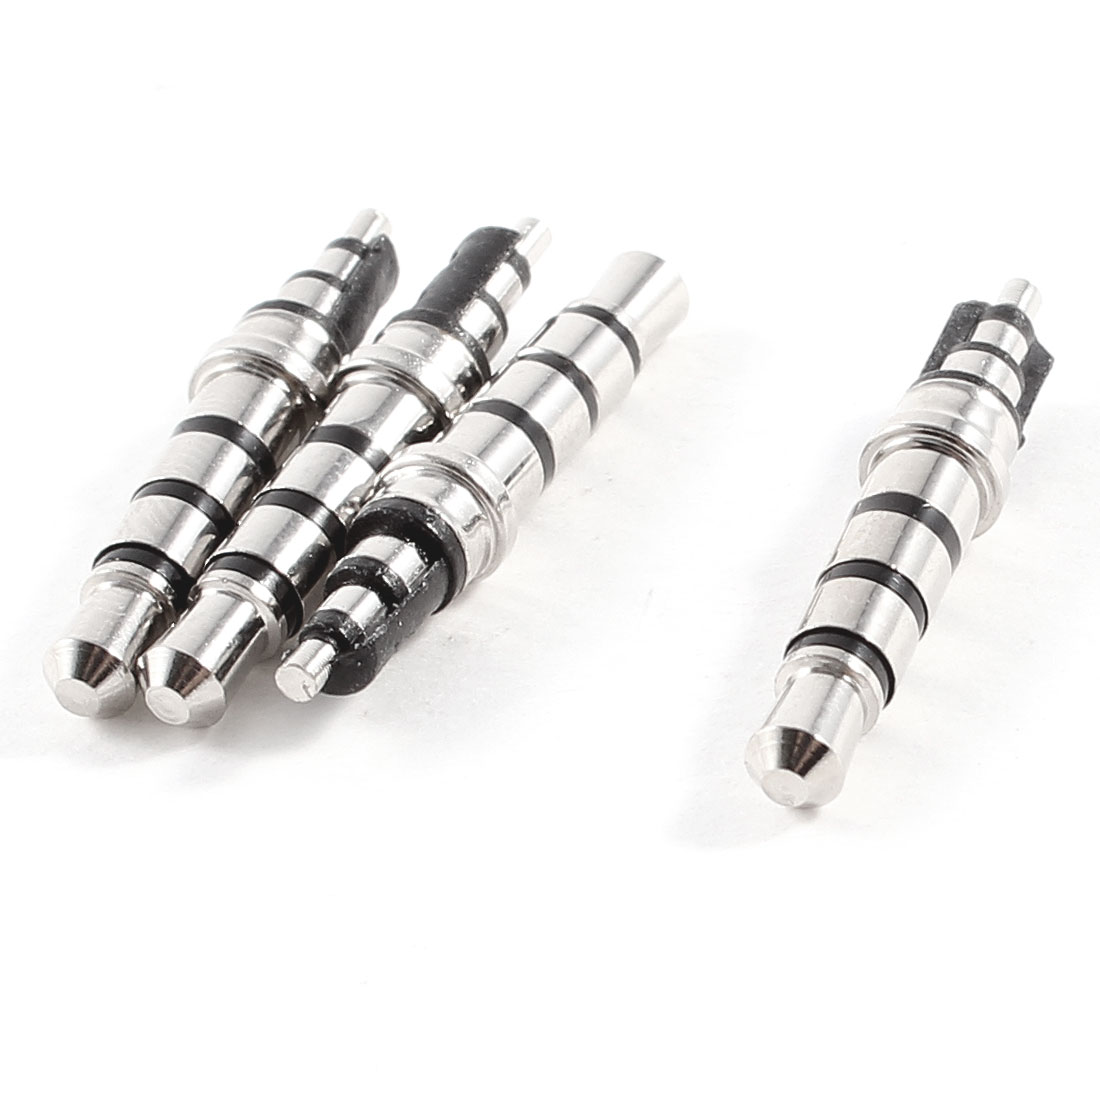 4pcs 3.5mm x 4.5mm x 24mm 4 Pole Male Plug Headphone Soldering Jack Silver Tone